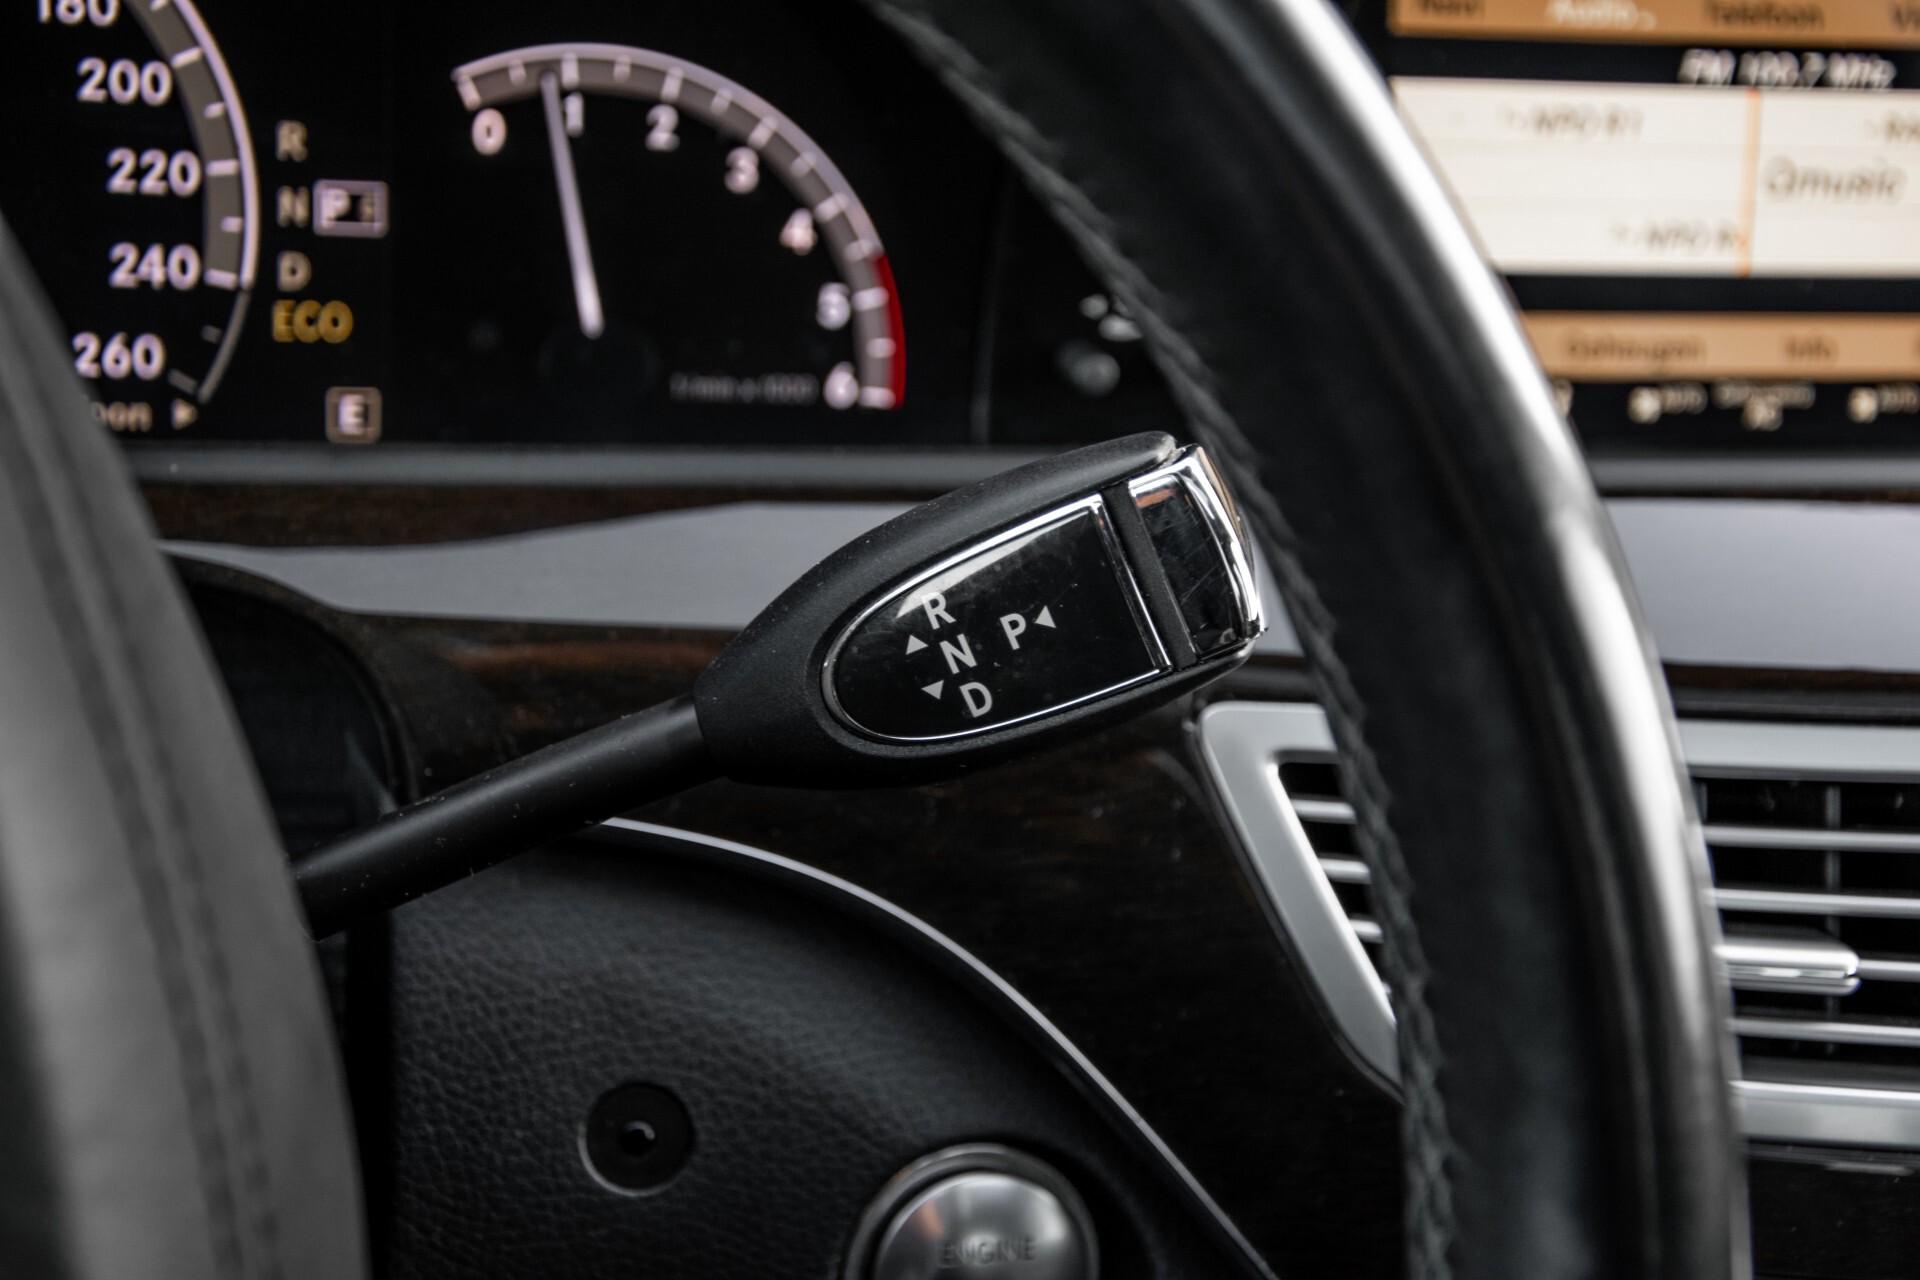 Mercedes-Benz S-Klasse 350 Bluetec Keyless/Distronic/Nightvision/Schuifdak/Harman-Kardon Aut7 Foto 15